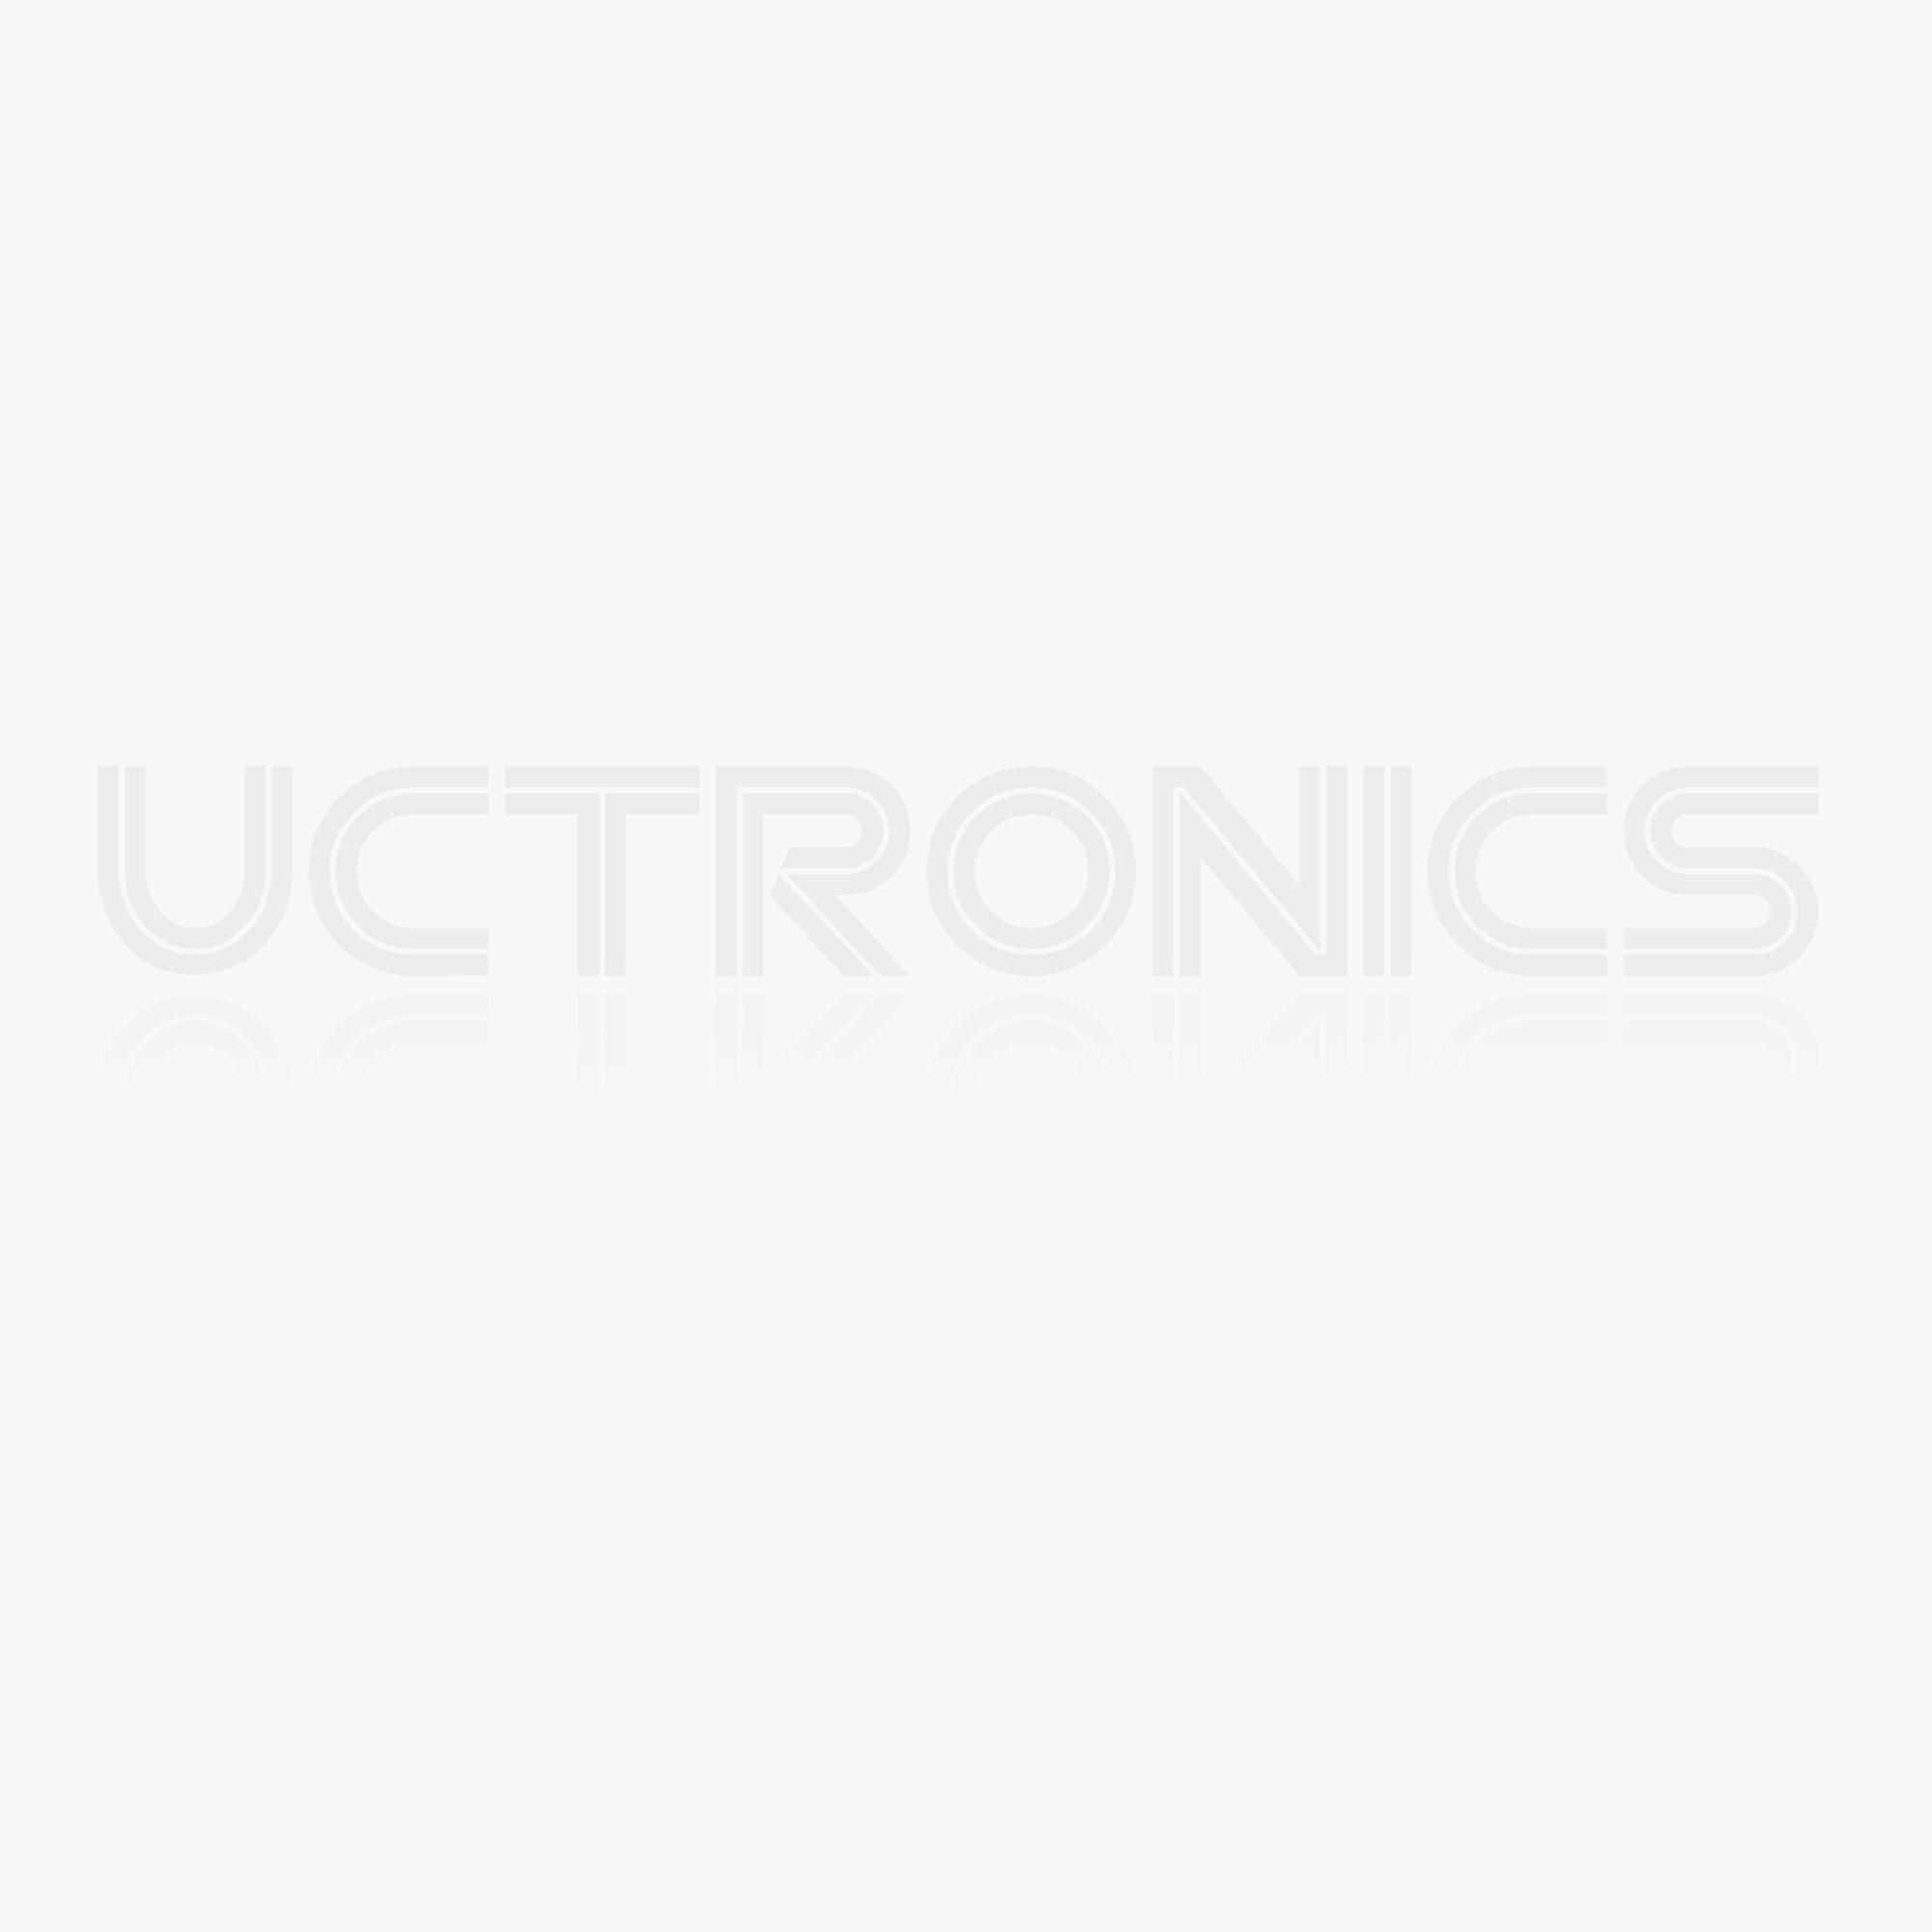 Arducam NOIR 8MP Sony IMX219 camera module with CS lens 2717 for Raspberry Pi